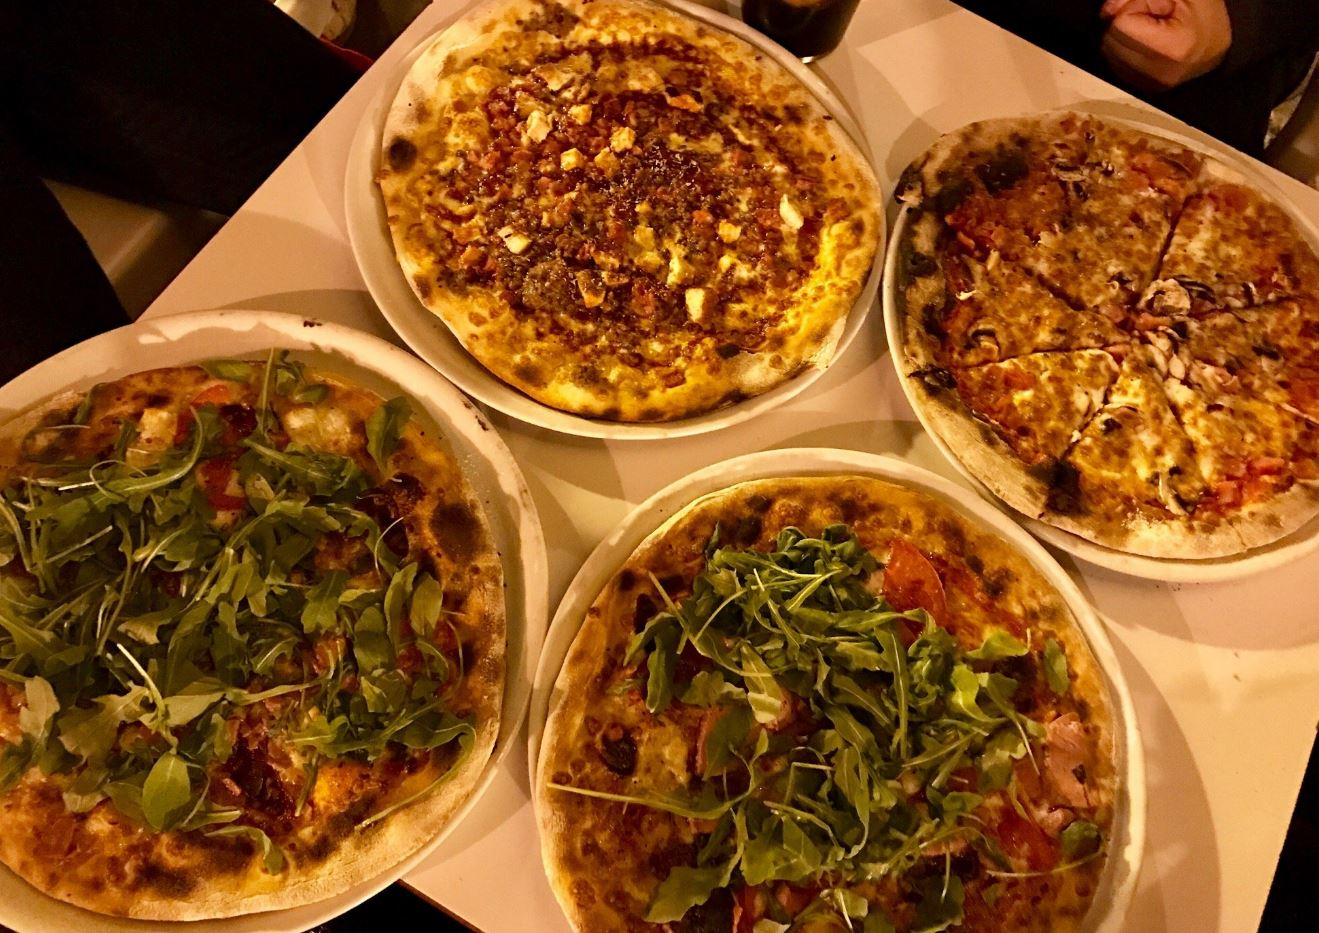 Pizzeria de Sevilla